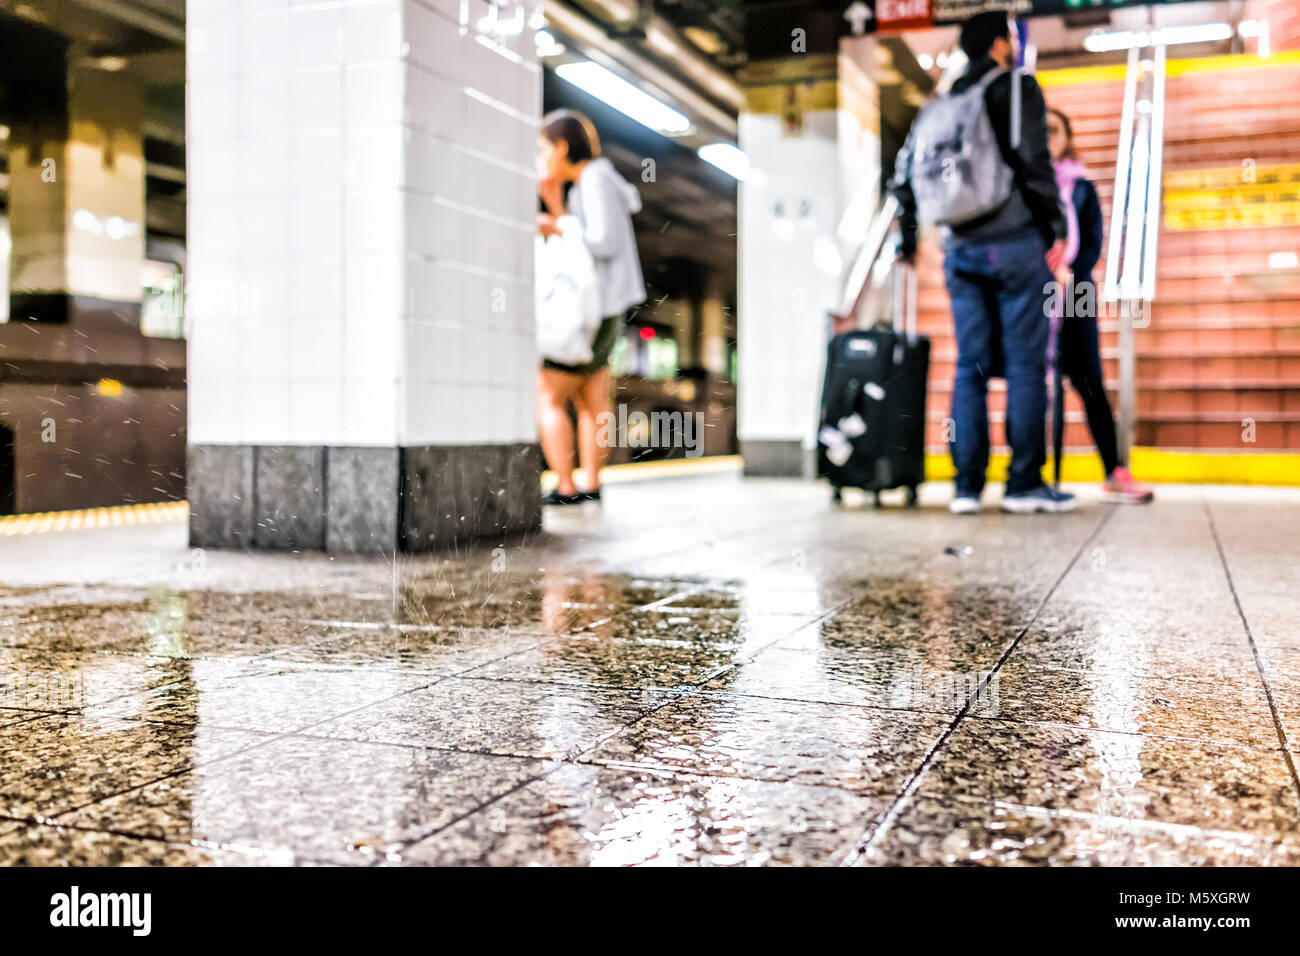 New York City, USA - October 29, 2017: People waiting in underground transit empty large platform in NYC Subway - Stock Image